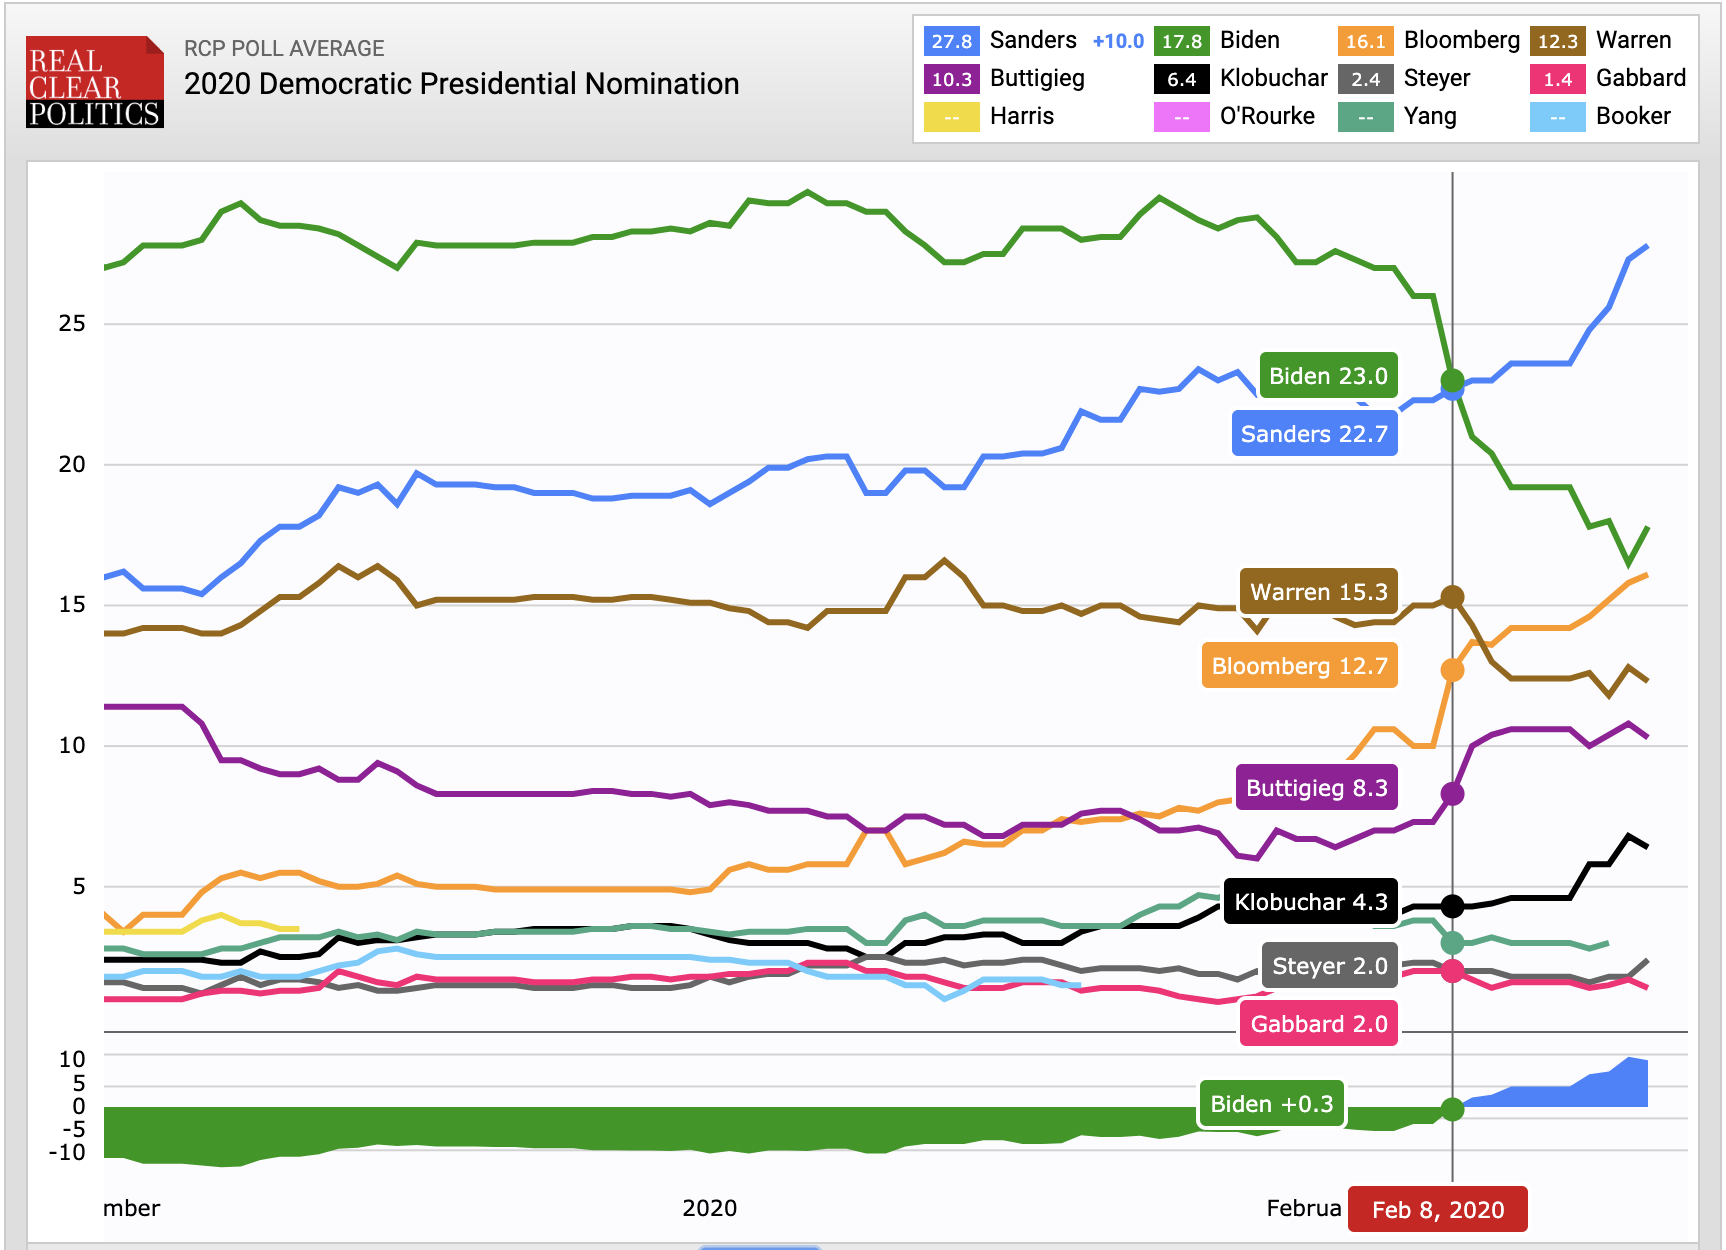 2020 Democratic Presidential Polling